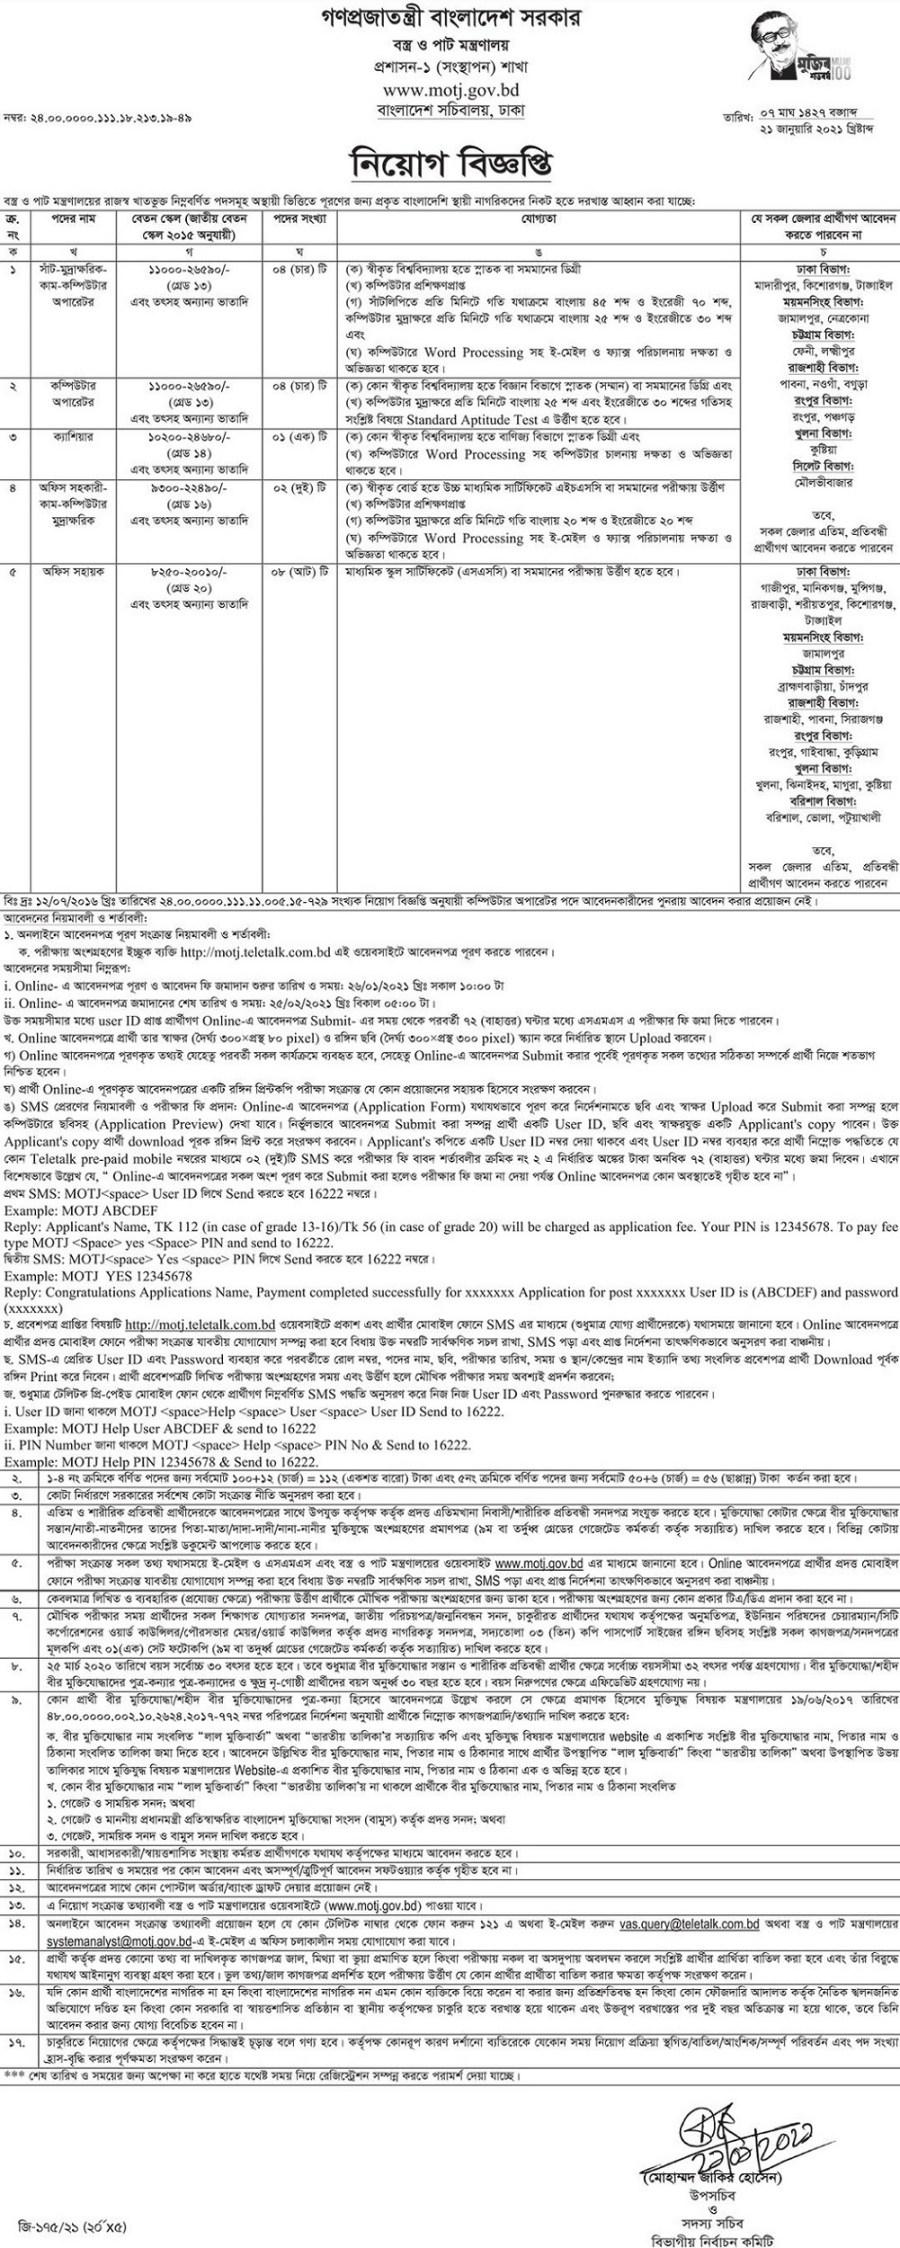 Ministry of Textiles and Jute (MOTJ) Job Circular February 2021